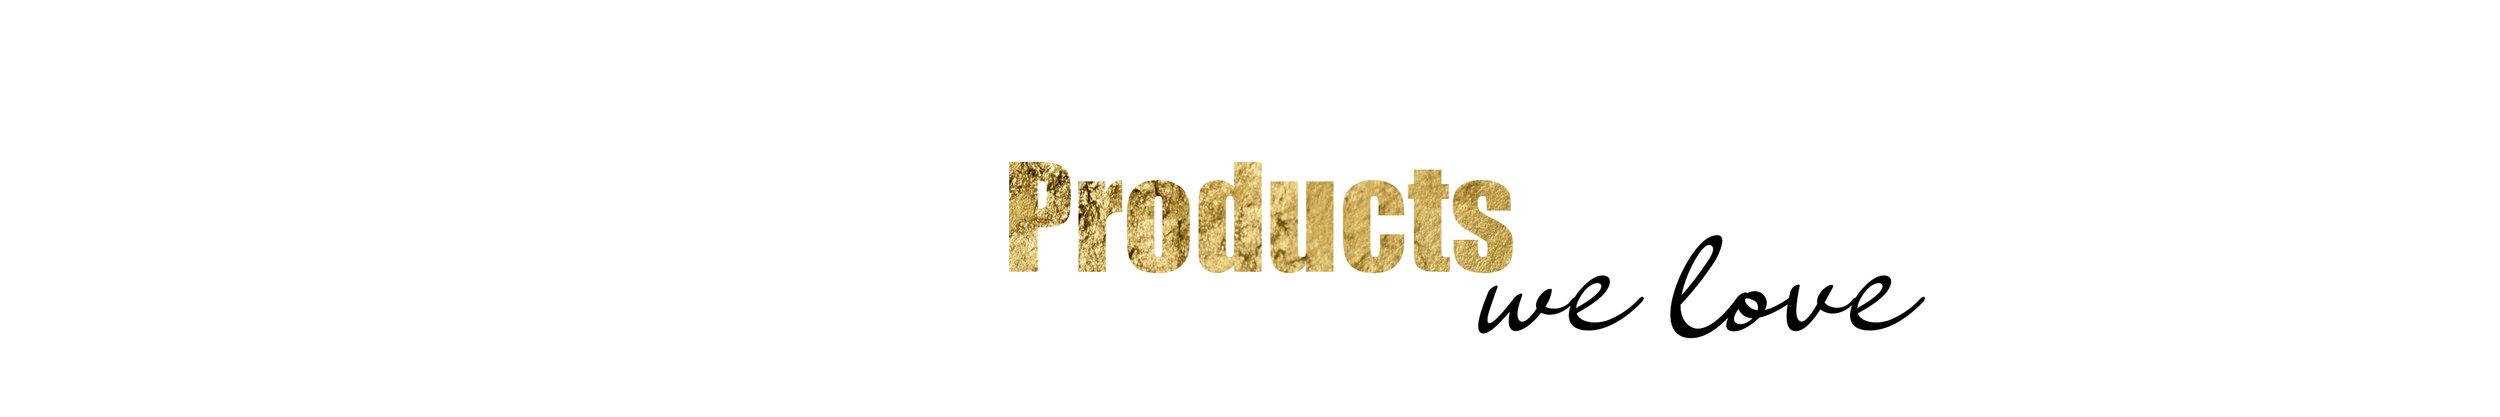 bannerProducts.jpg